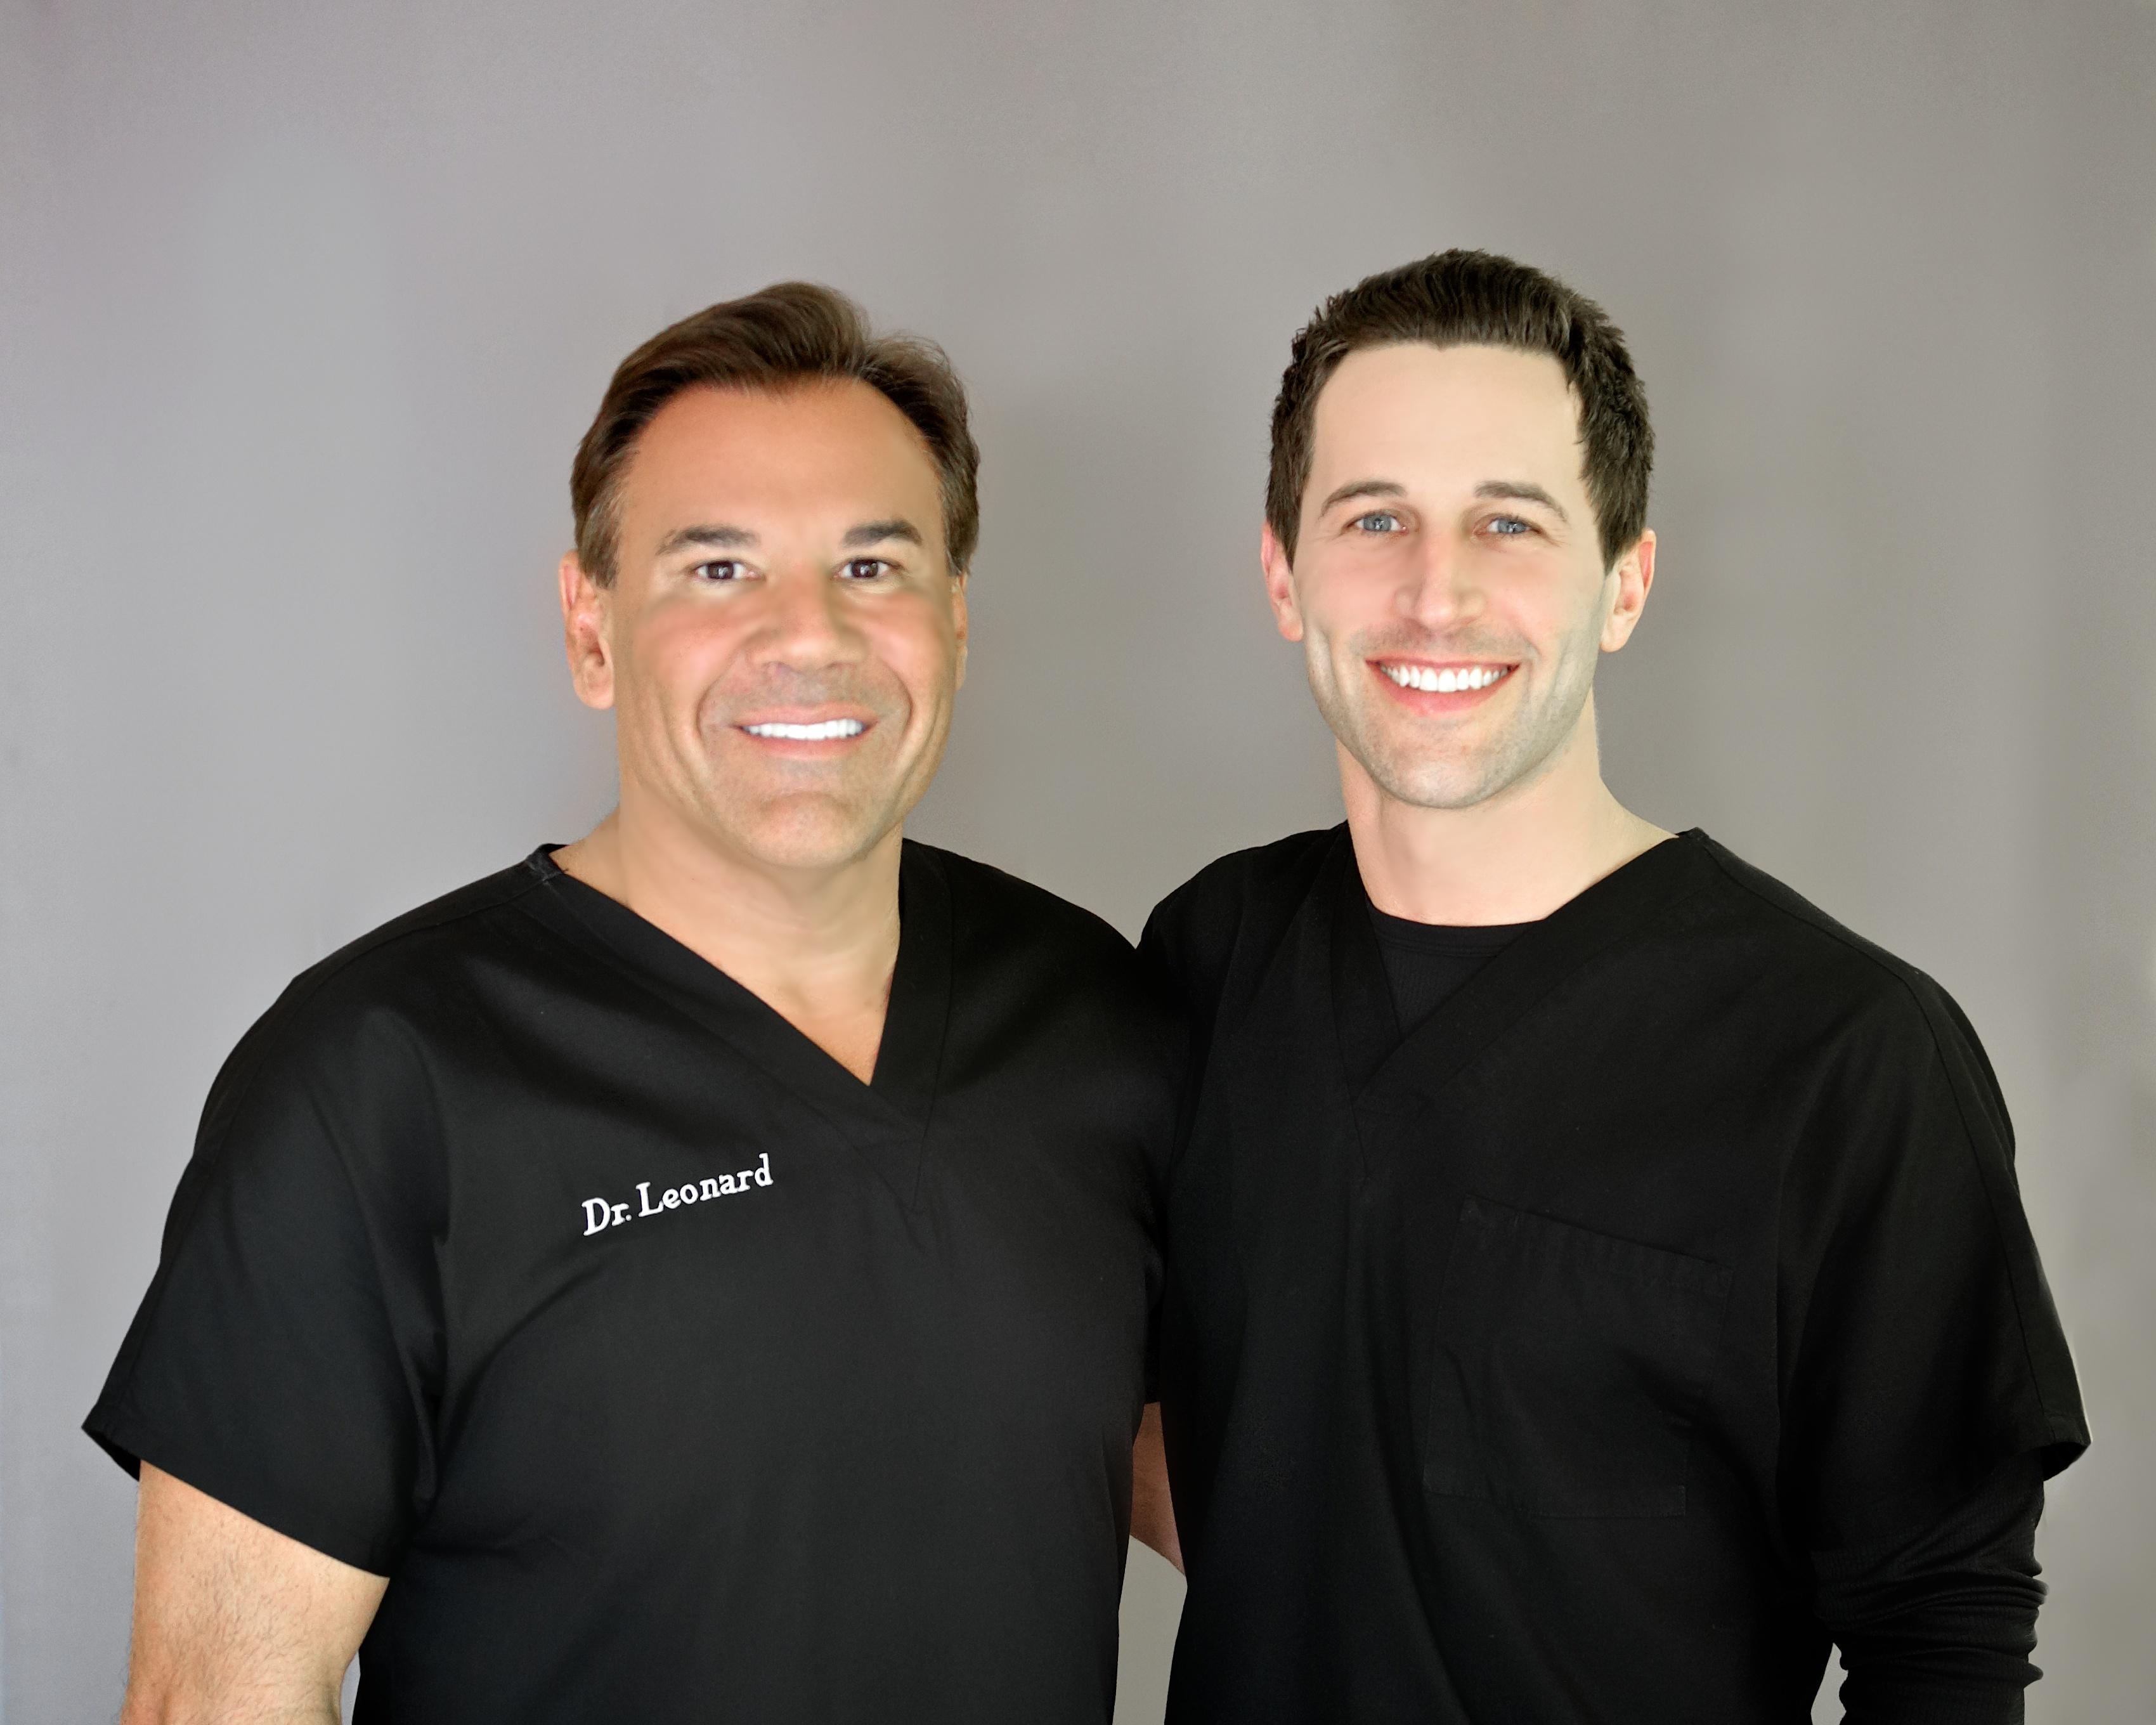 Dr. Robert Leonard welcomes Dr. Matthew Lopresti to Leonard Hair Transplant Associates. (Photo: Business Wire)